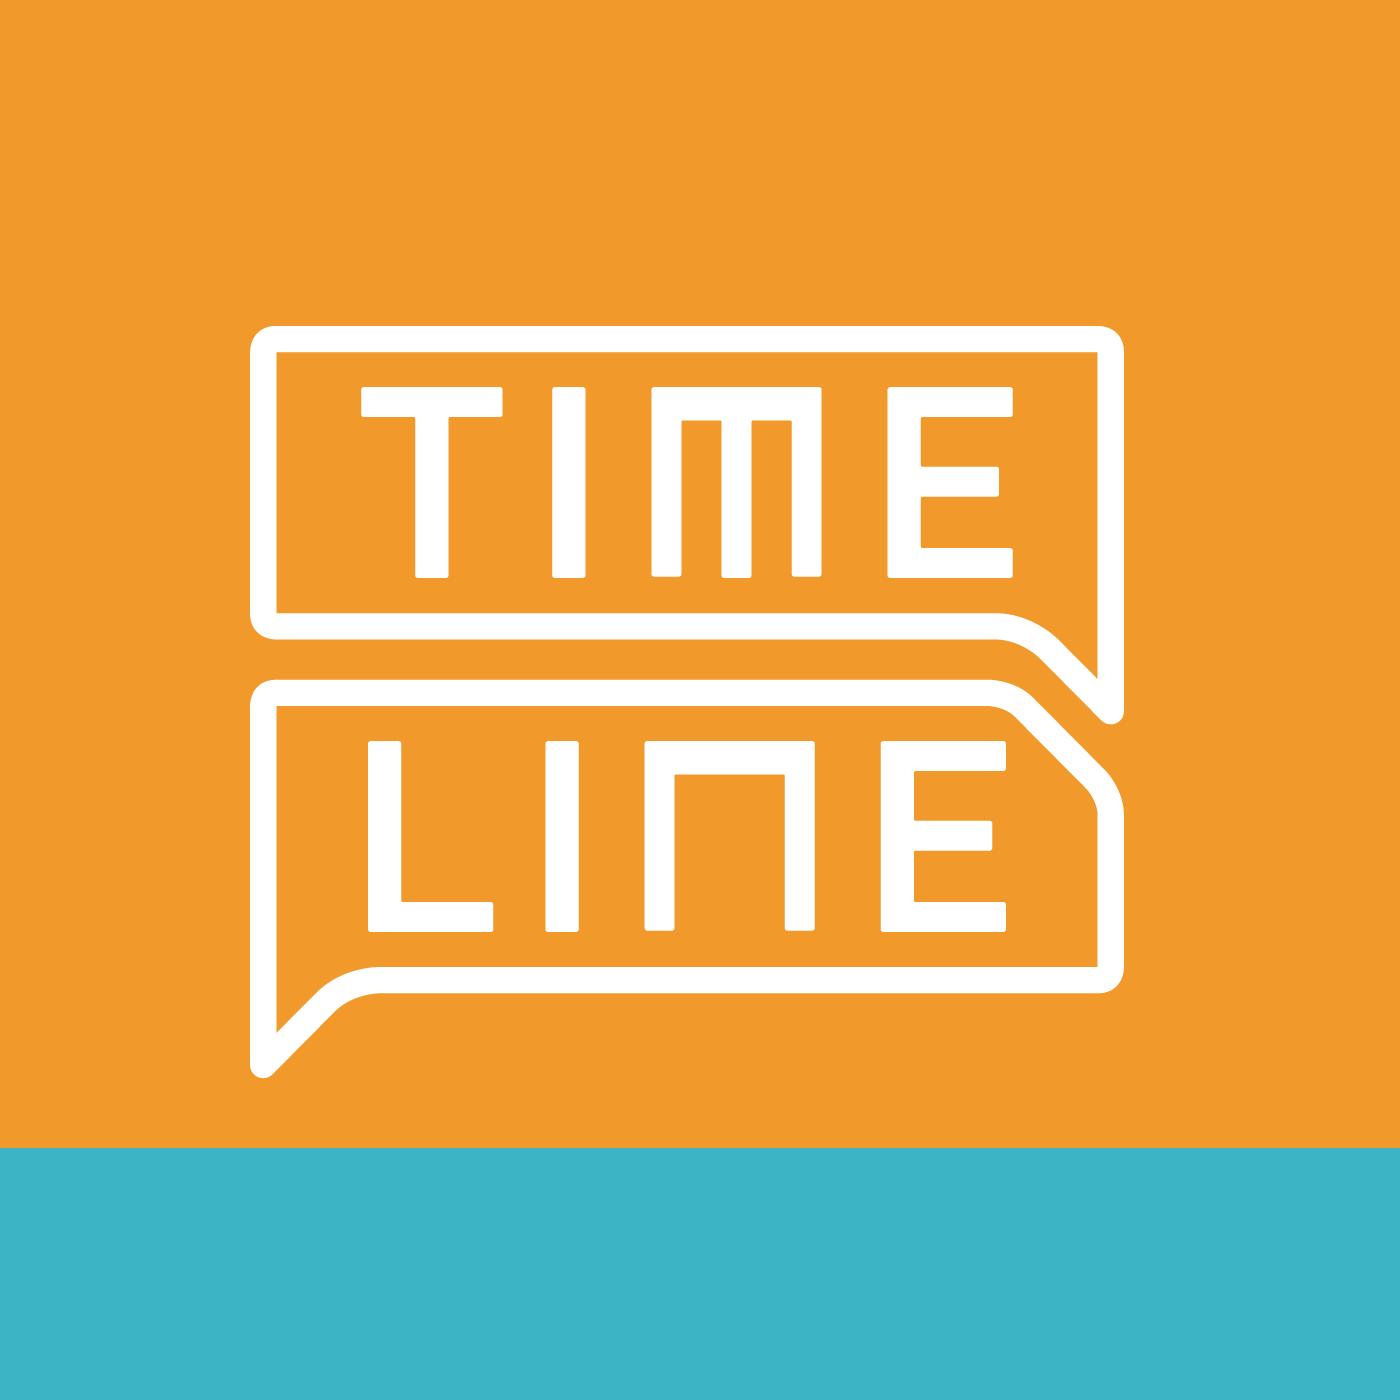 Timeline Gaúcha - 18/04/2017